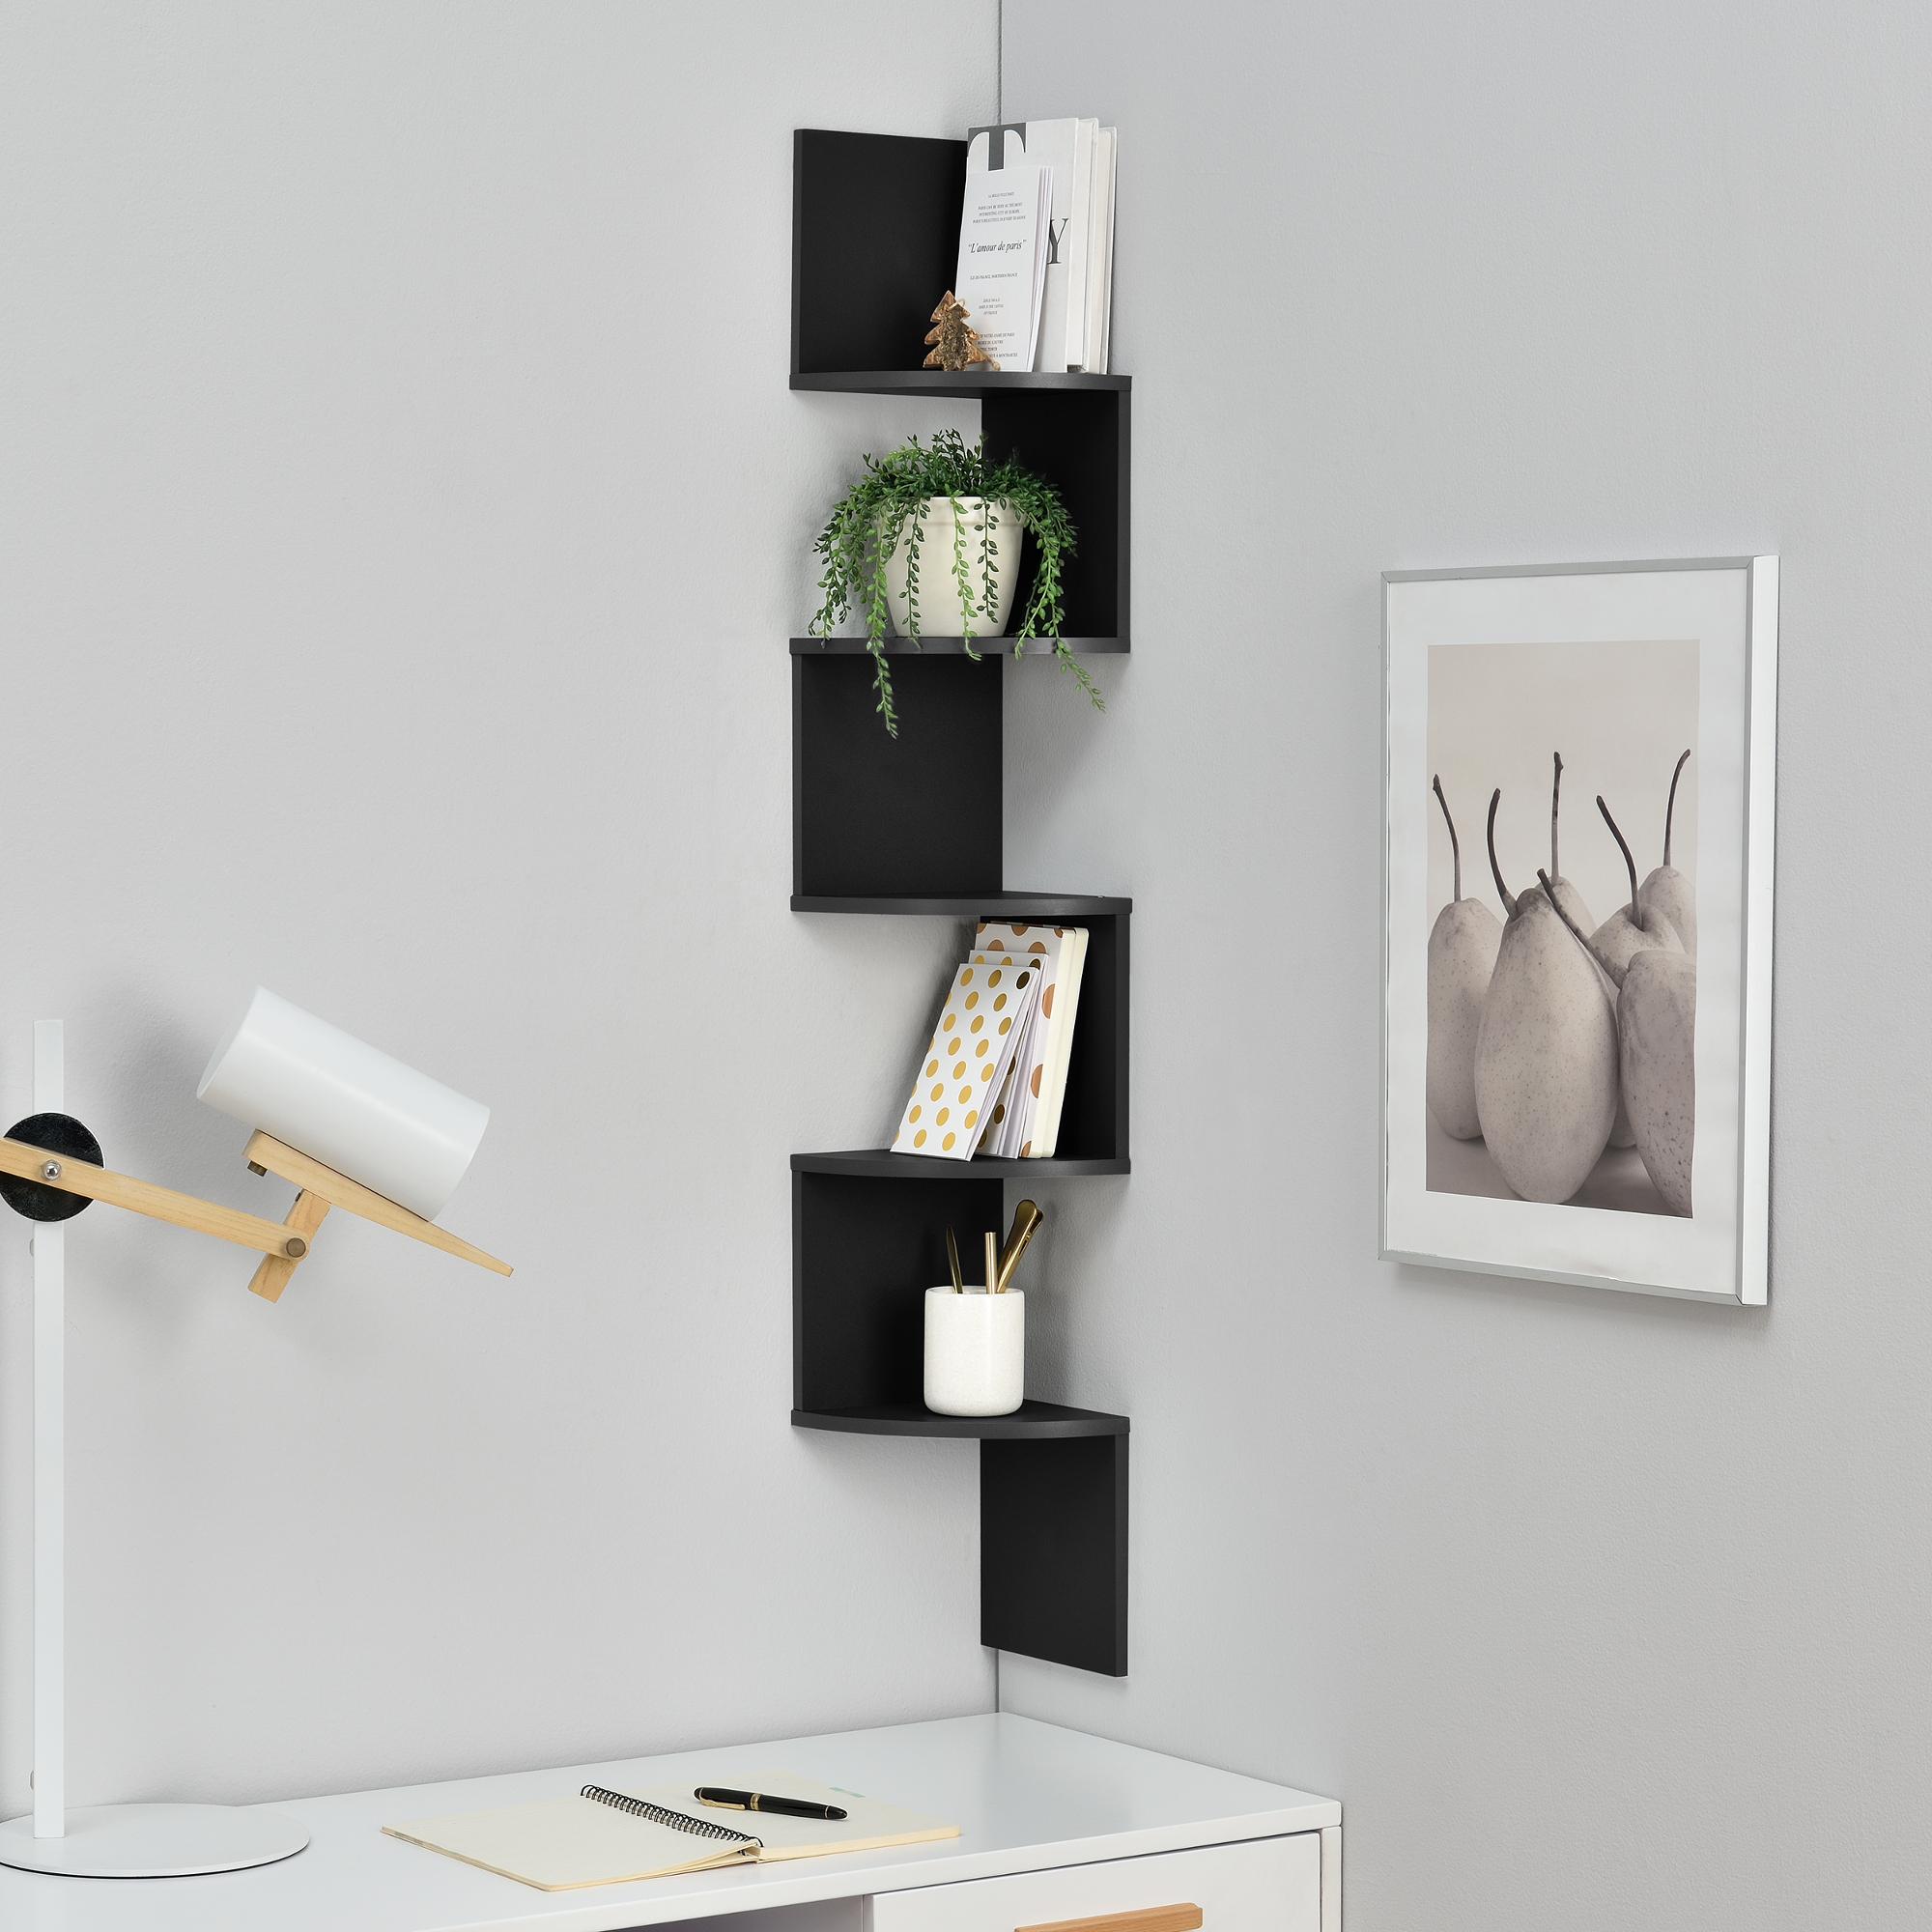 de la pared estante negro x x cm mdf